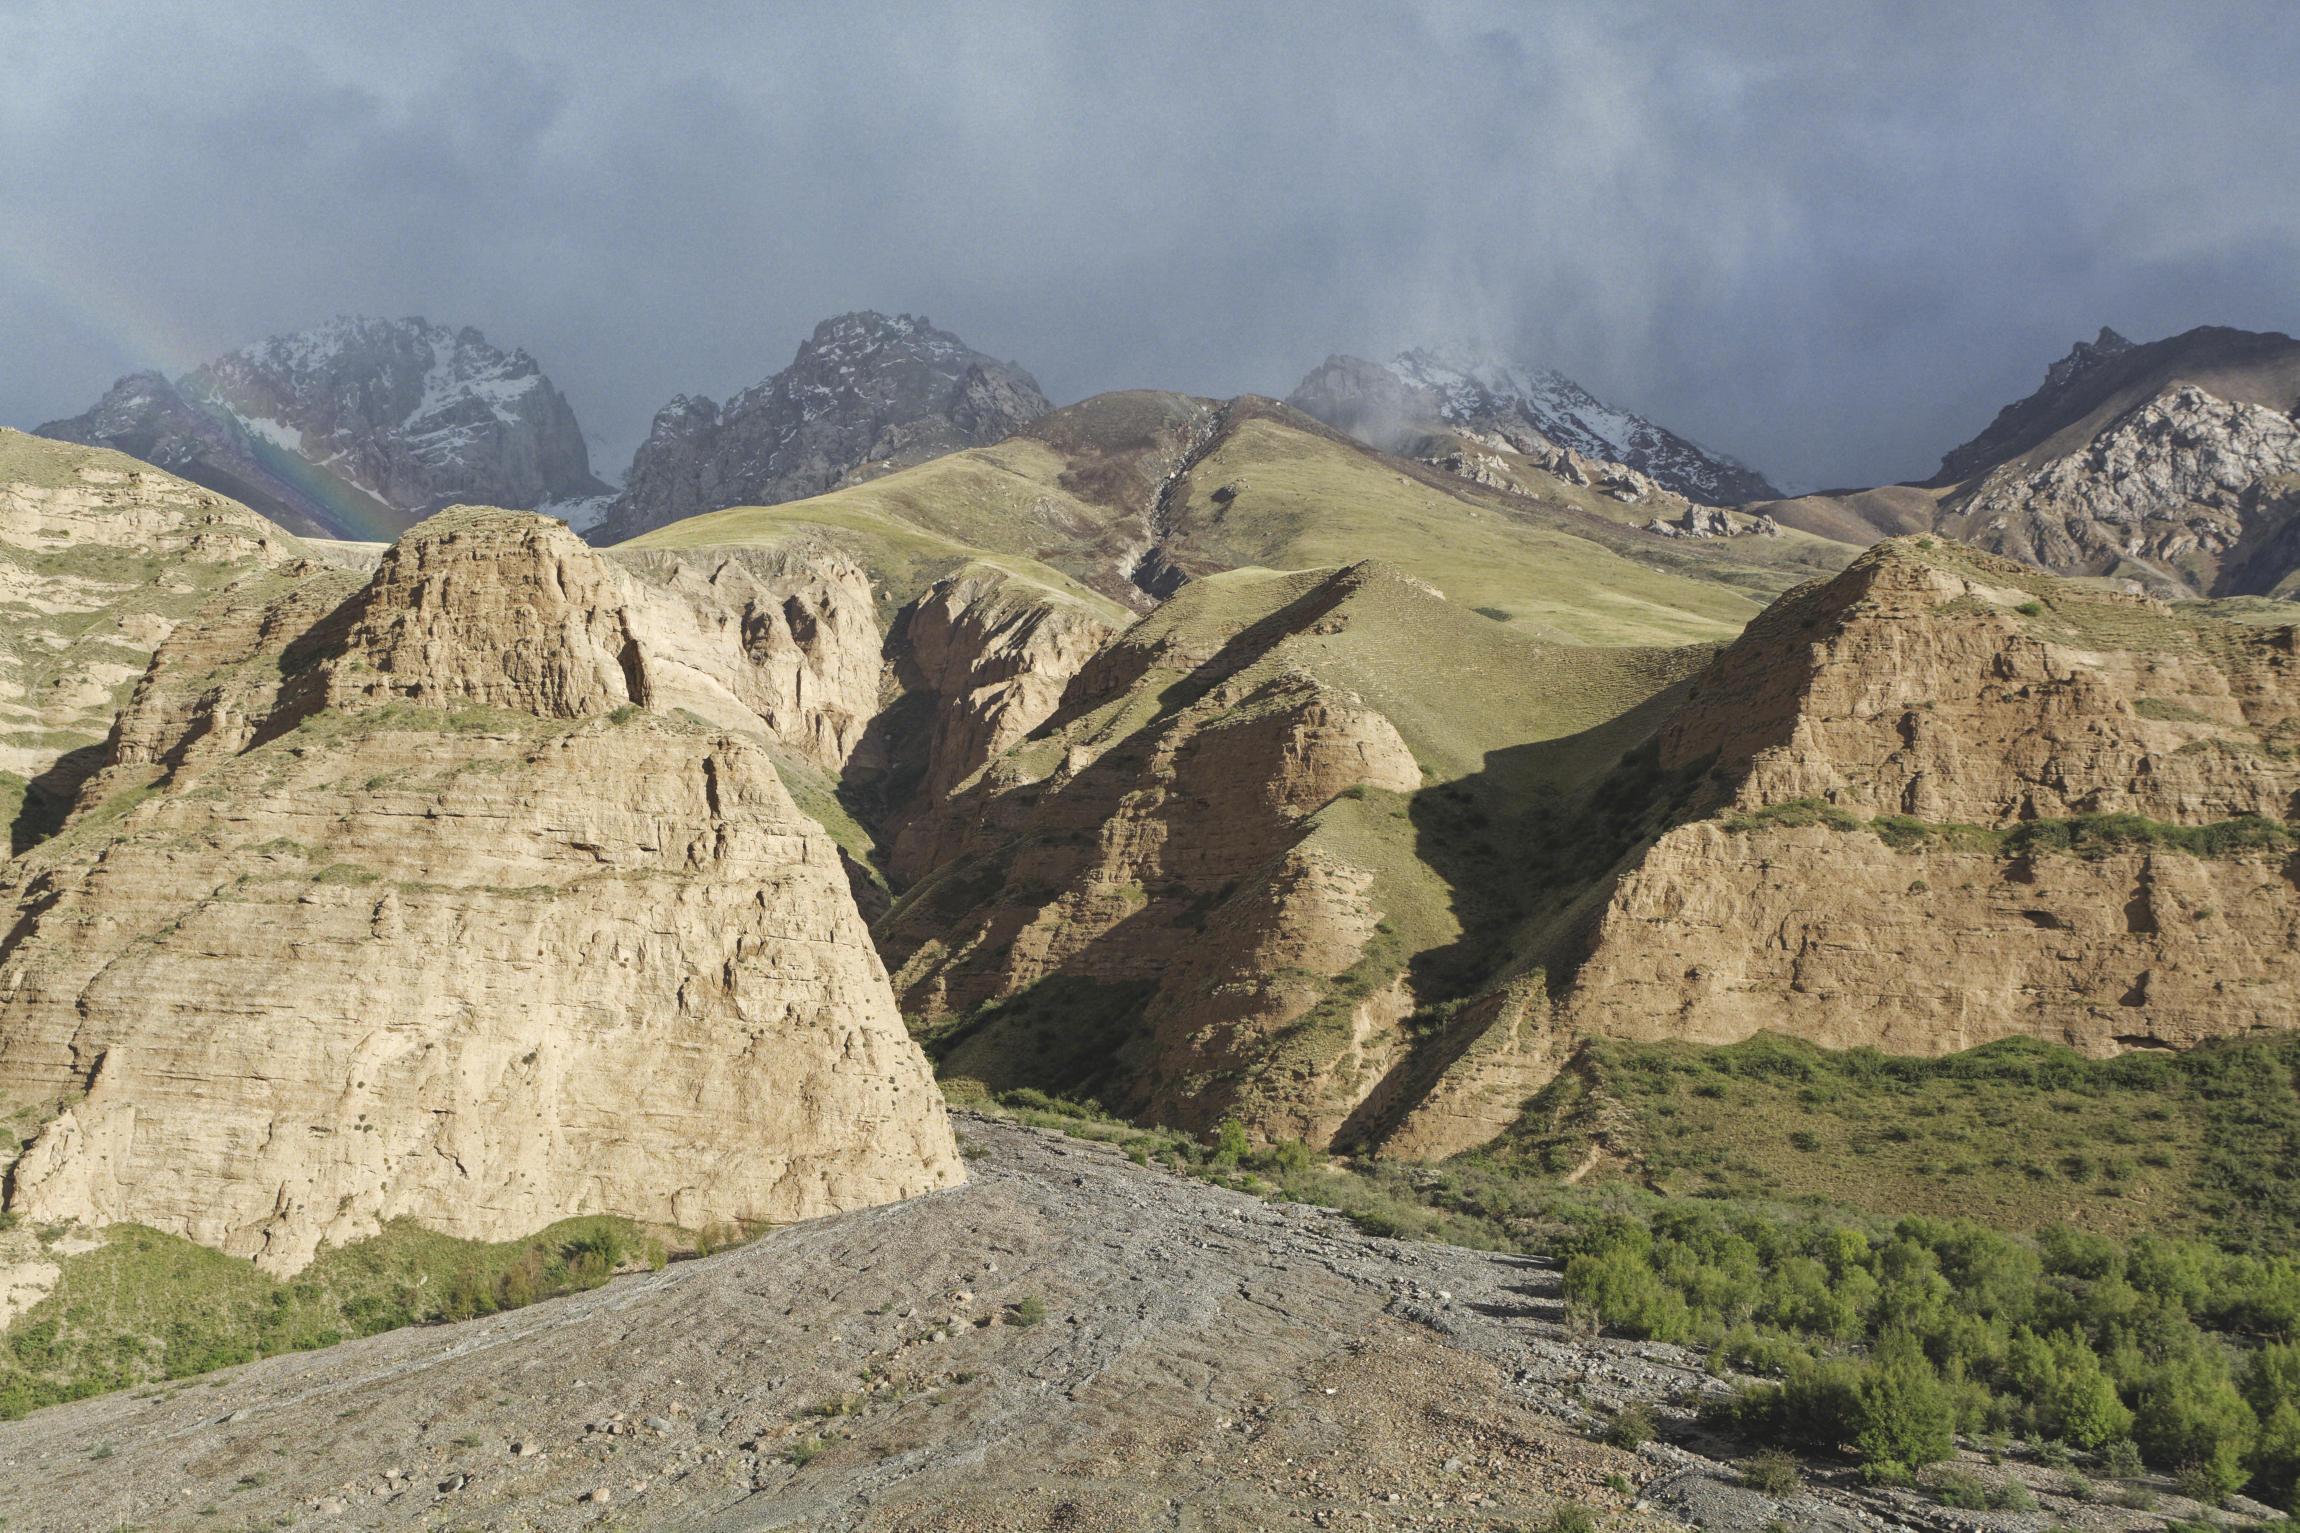 Falaises vallée de Kaindy Kirghizstan